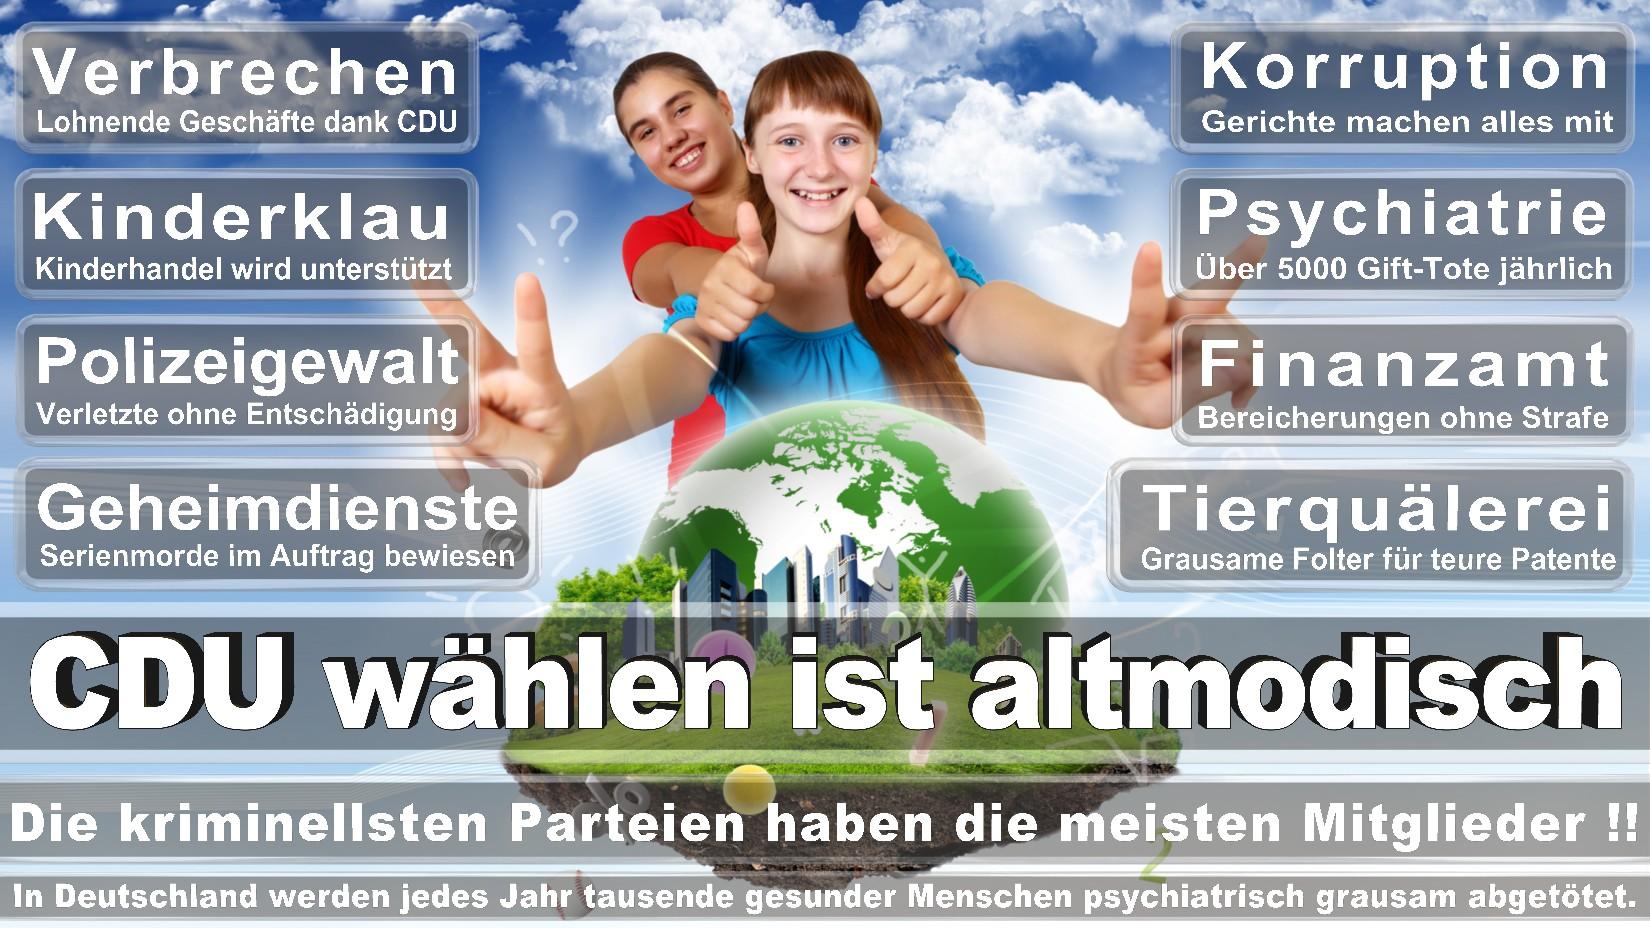 Angela-Merkel-CDU (14)